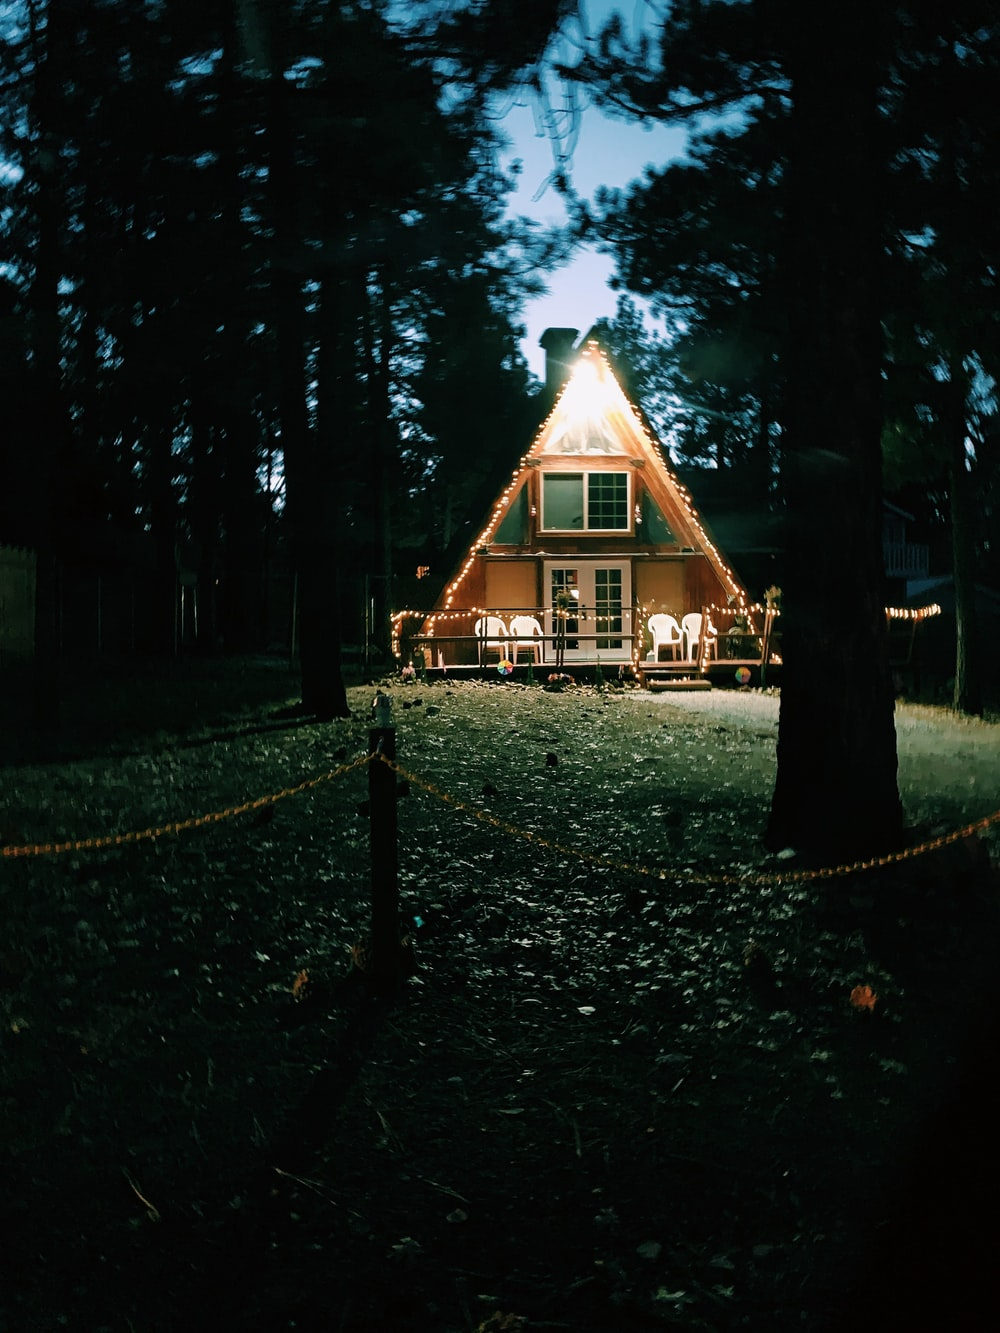 brown wooden shack beside trees